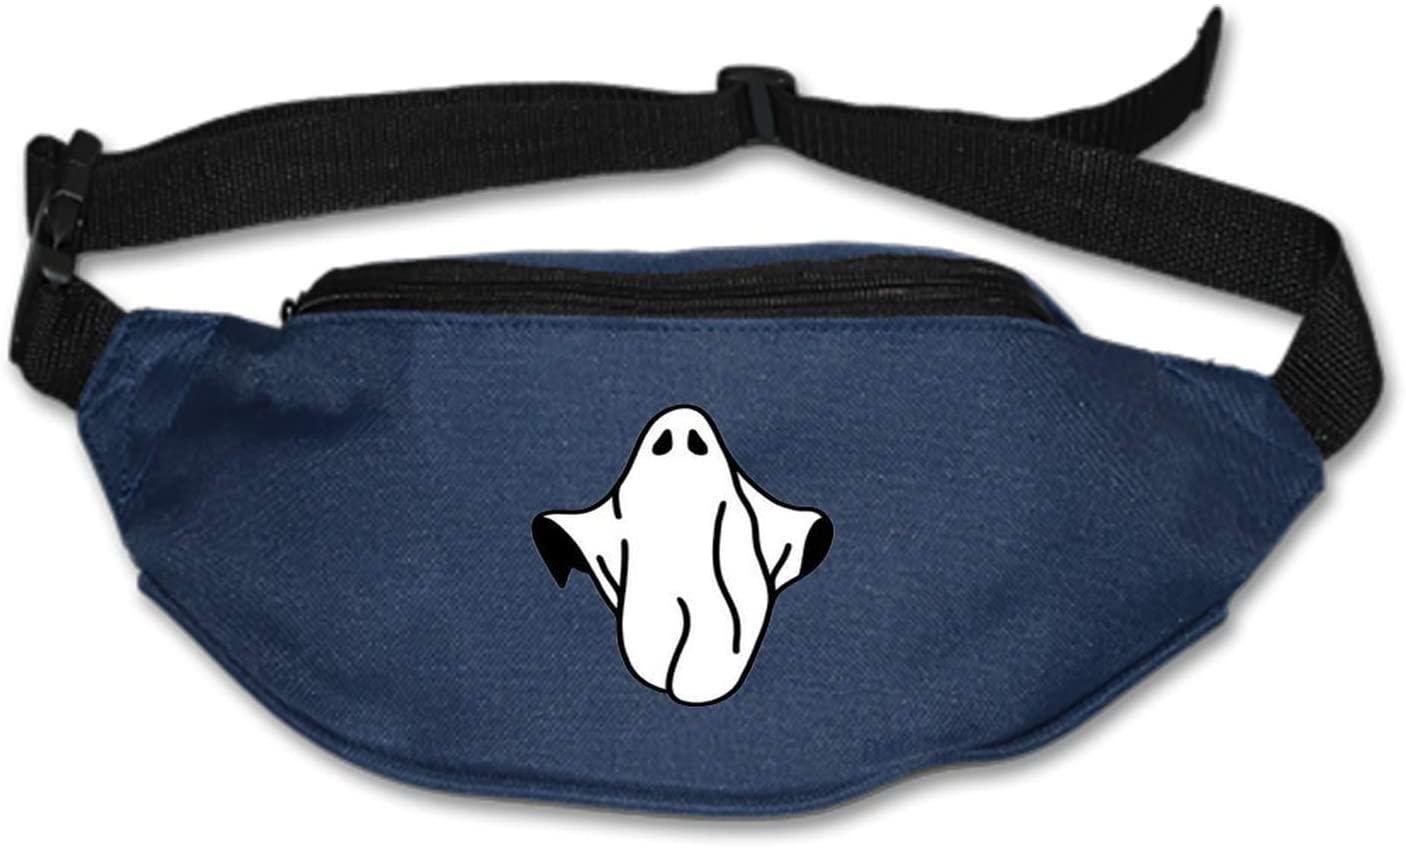 SEVTNY Waist Bag Fourth-of-july Fanny Pack Stealth Travel bum Bags Running Pocket For Men Women